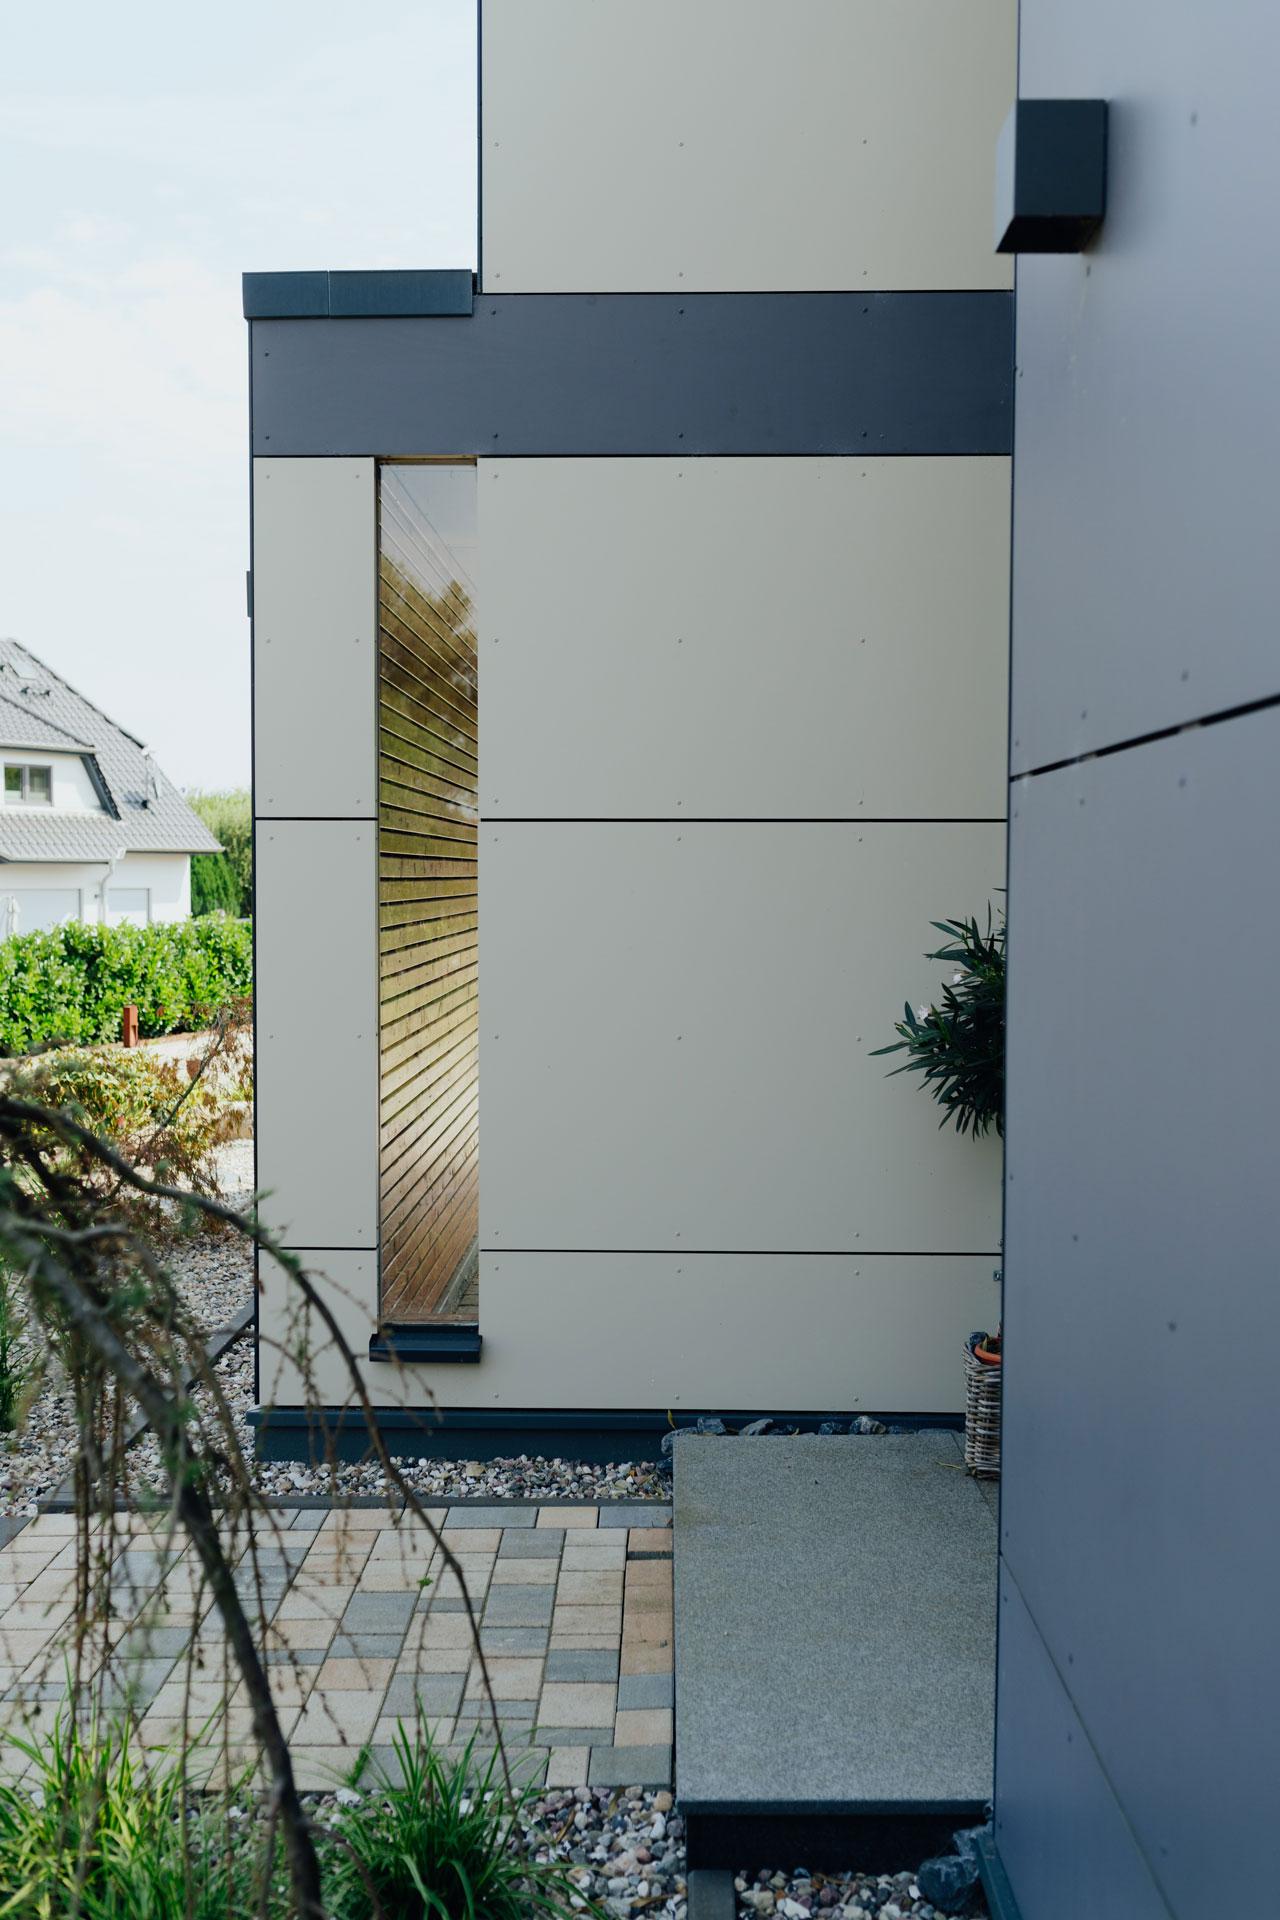 Einfamilienhaus im Landkreis Bad Doberan (07) / Nahaufnahme